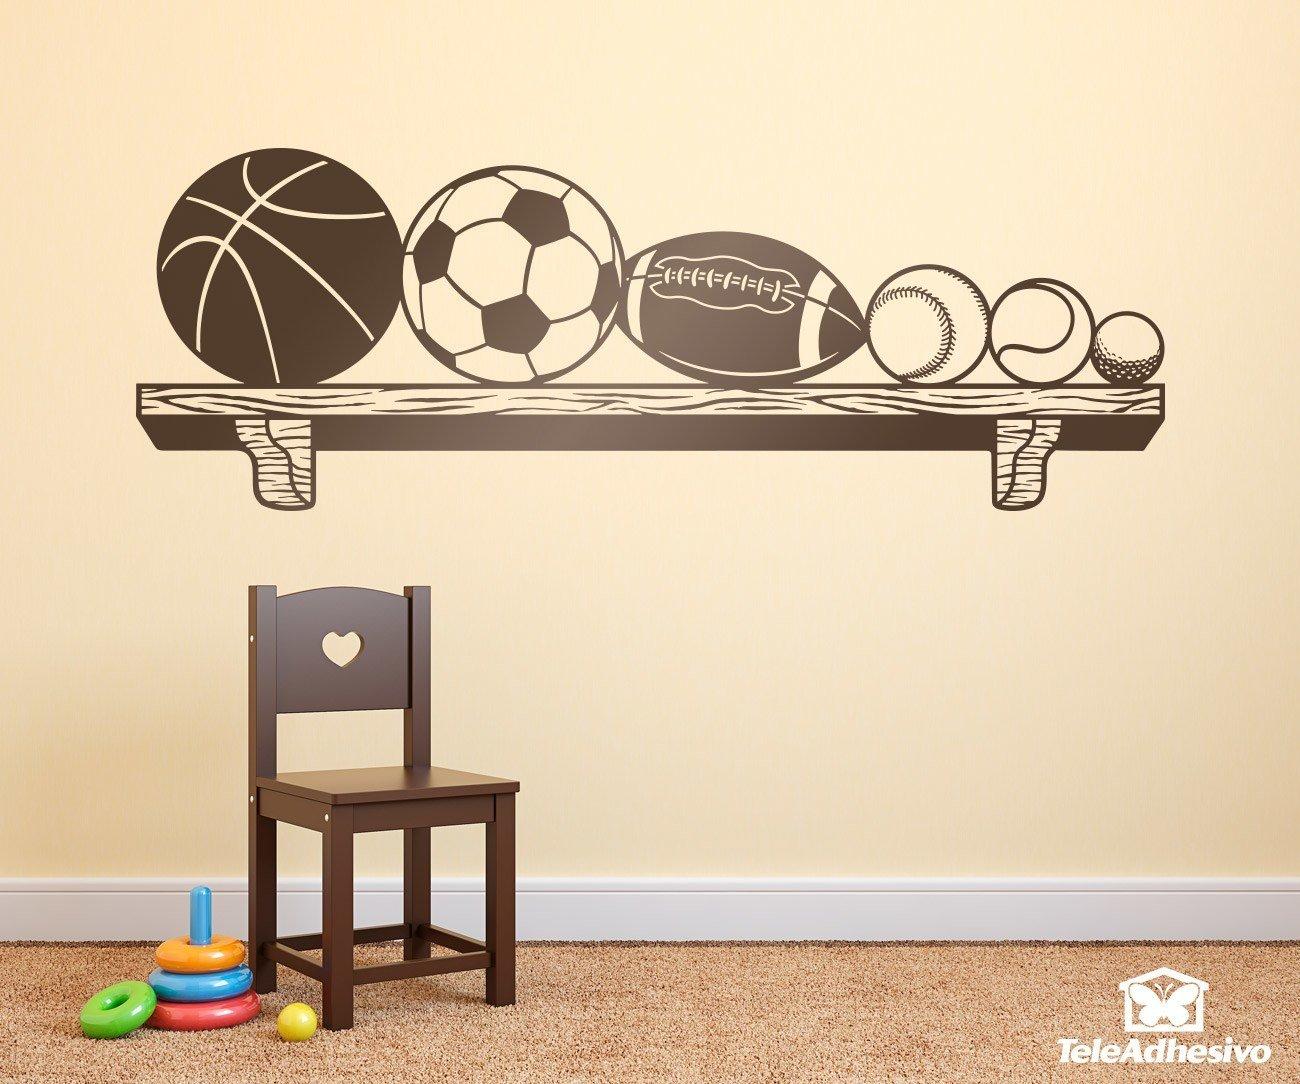 Vinilo decorativo de estante con pelotas o balones de - Vinilos de motos para pared ...